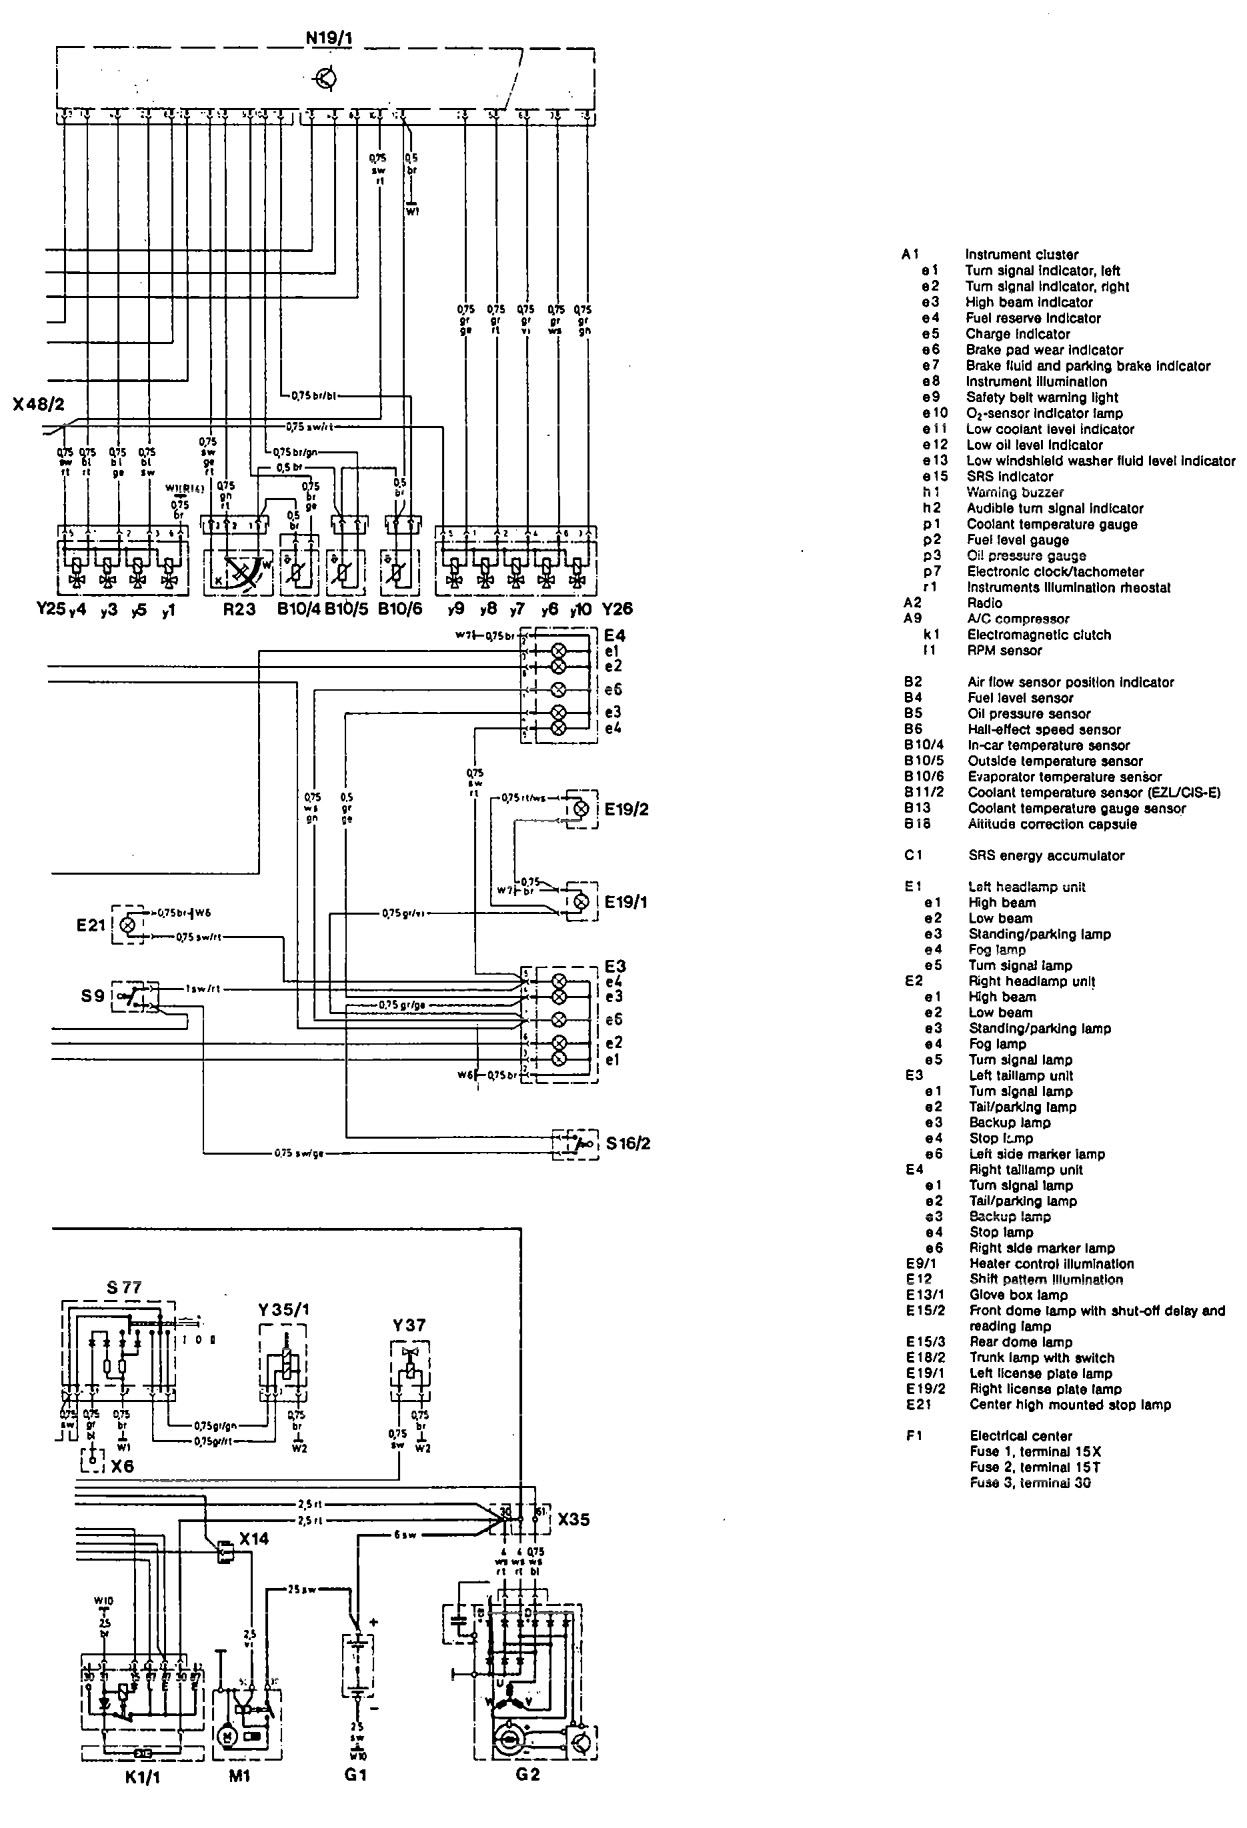 1992 mercedes 500sl wiring diagram bmw e46 amplifier benz 190e diagrams starting carknowledge